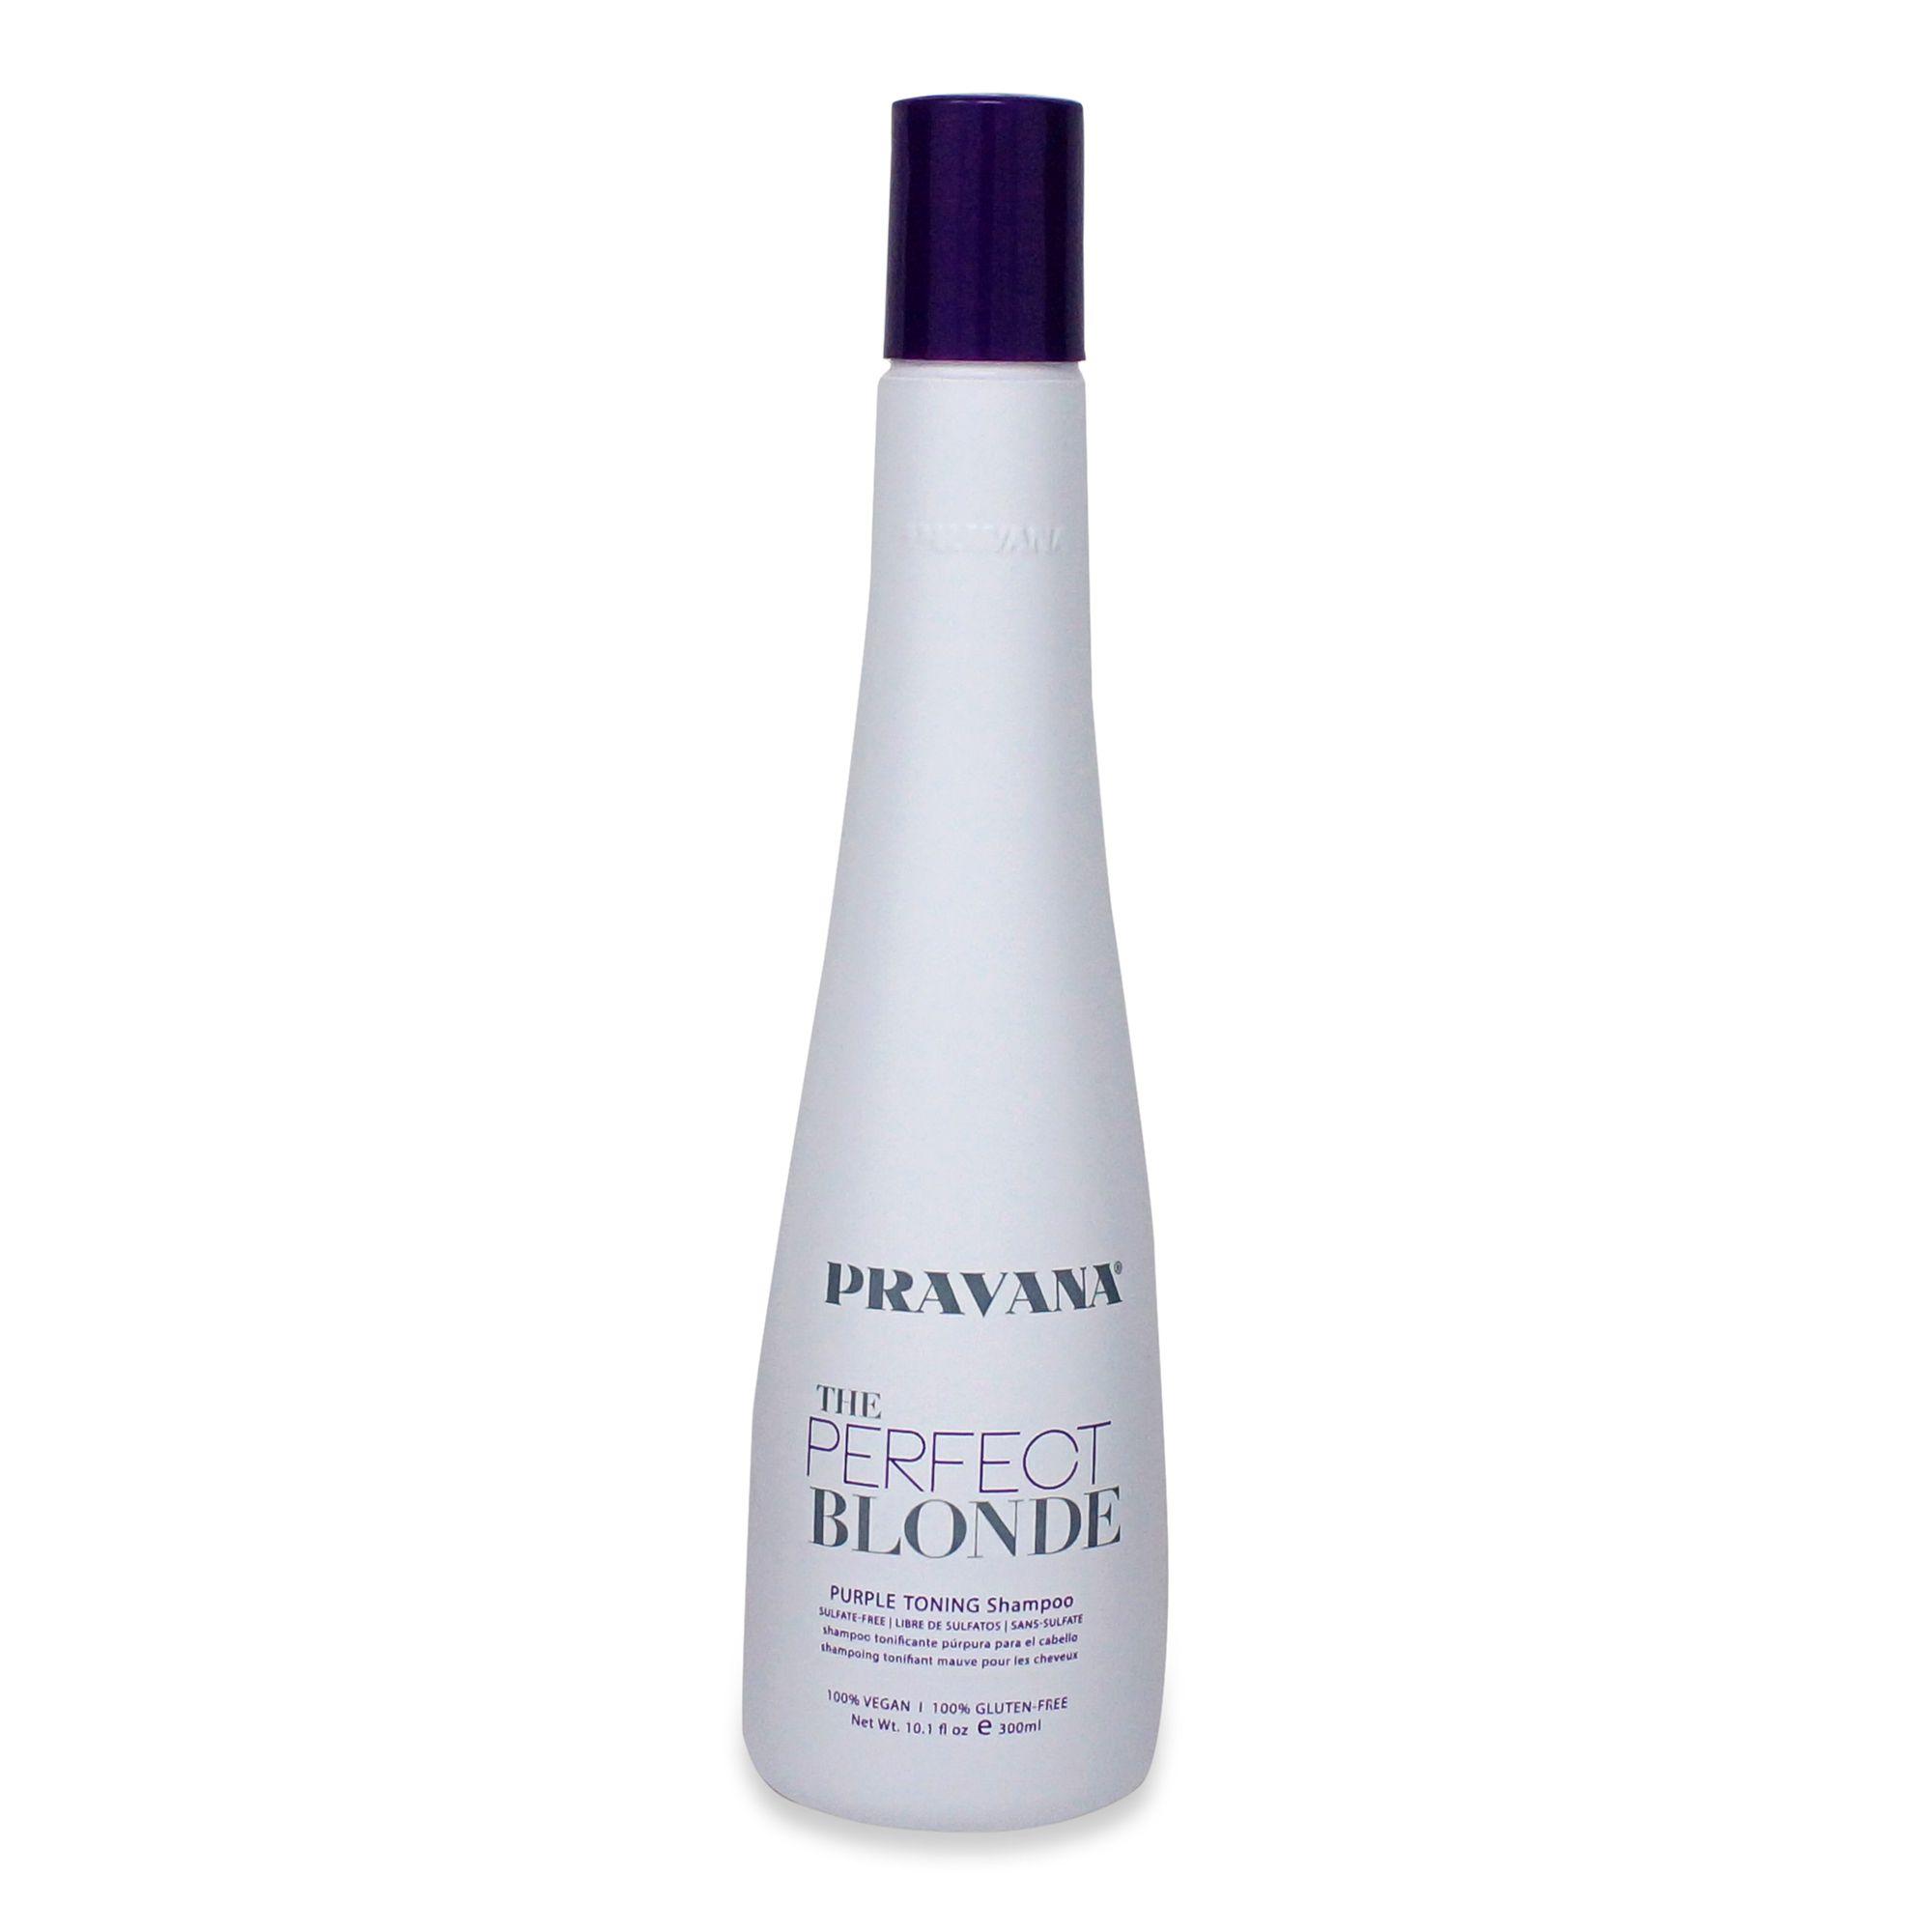 pravana the perfect blonde shampoo